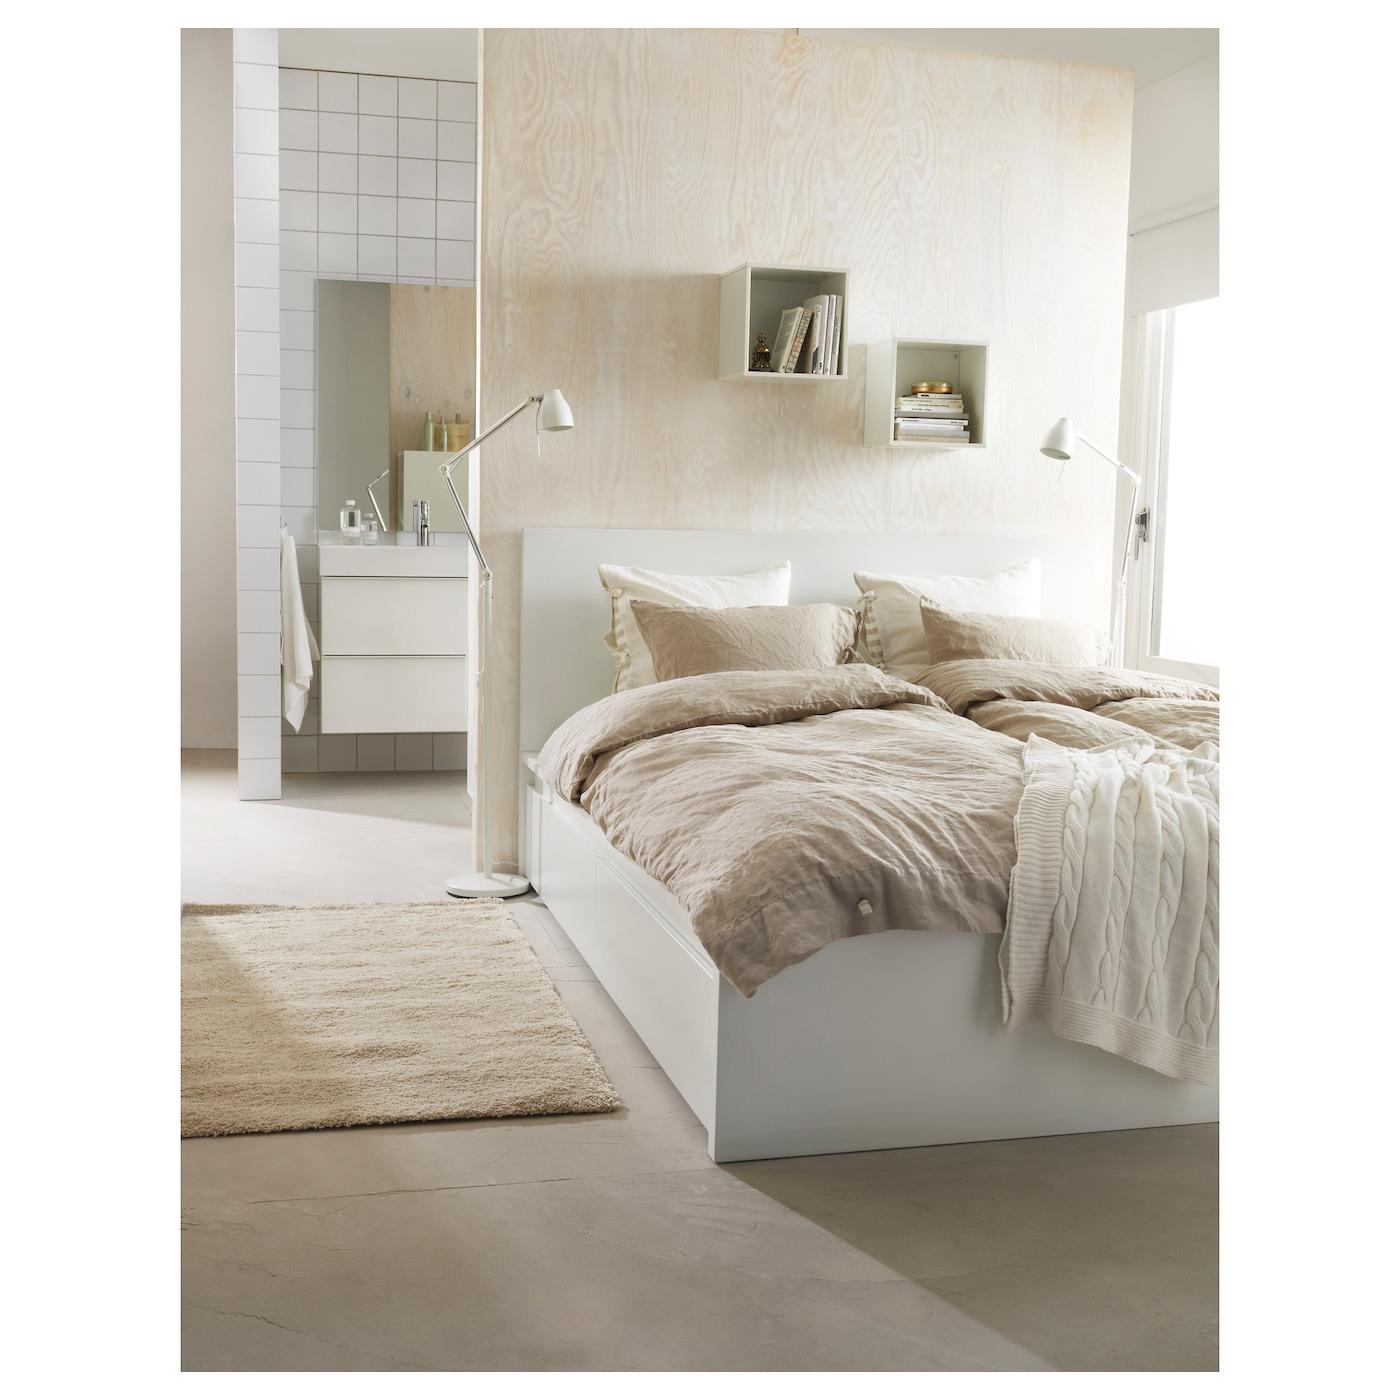 malm cadre de lit haut 2 rangements blanc leirsund 160 x 200 cm ikea. Black Bedroom Furniture Sets. Home Design Ideas